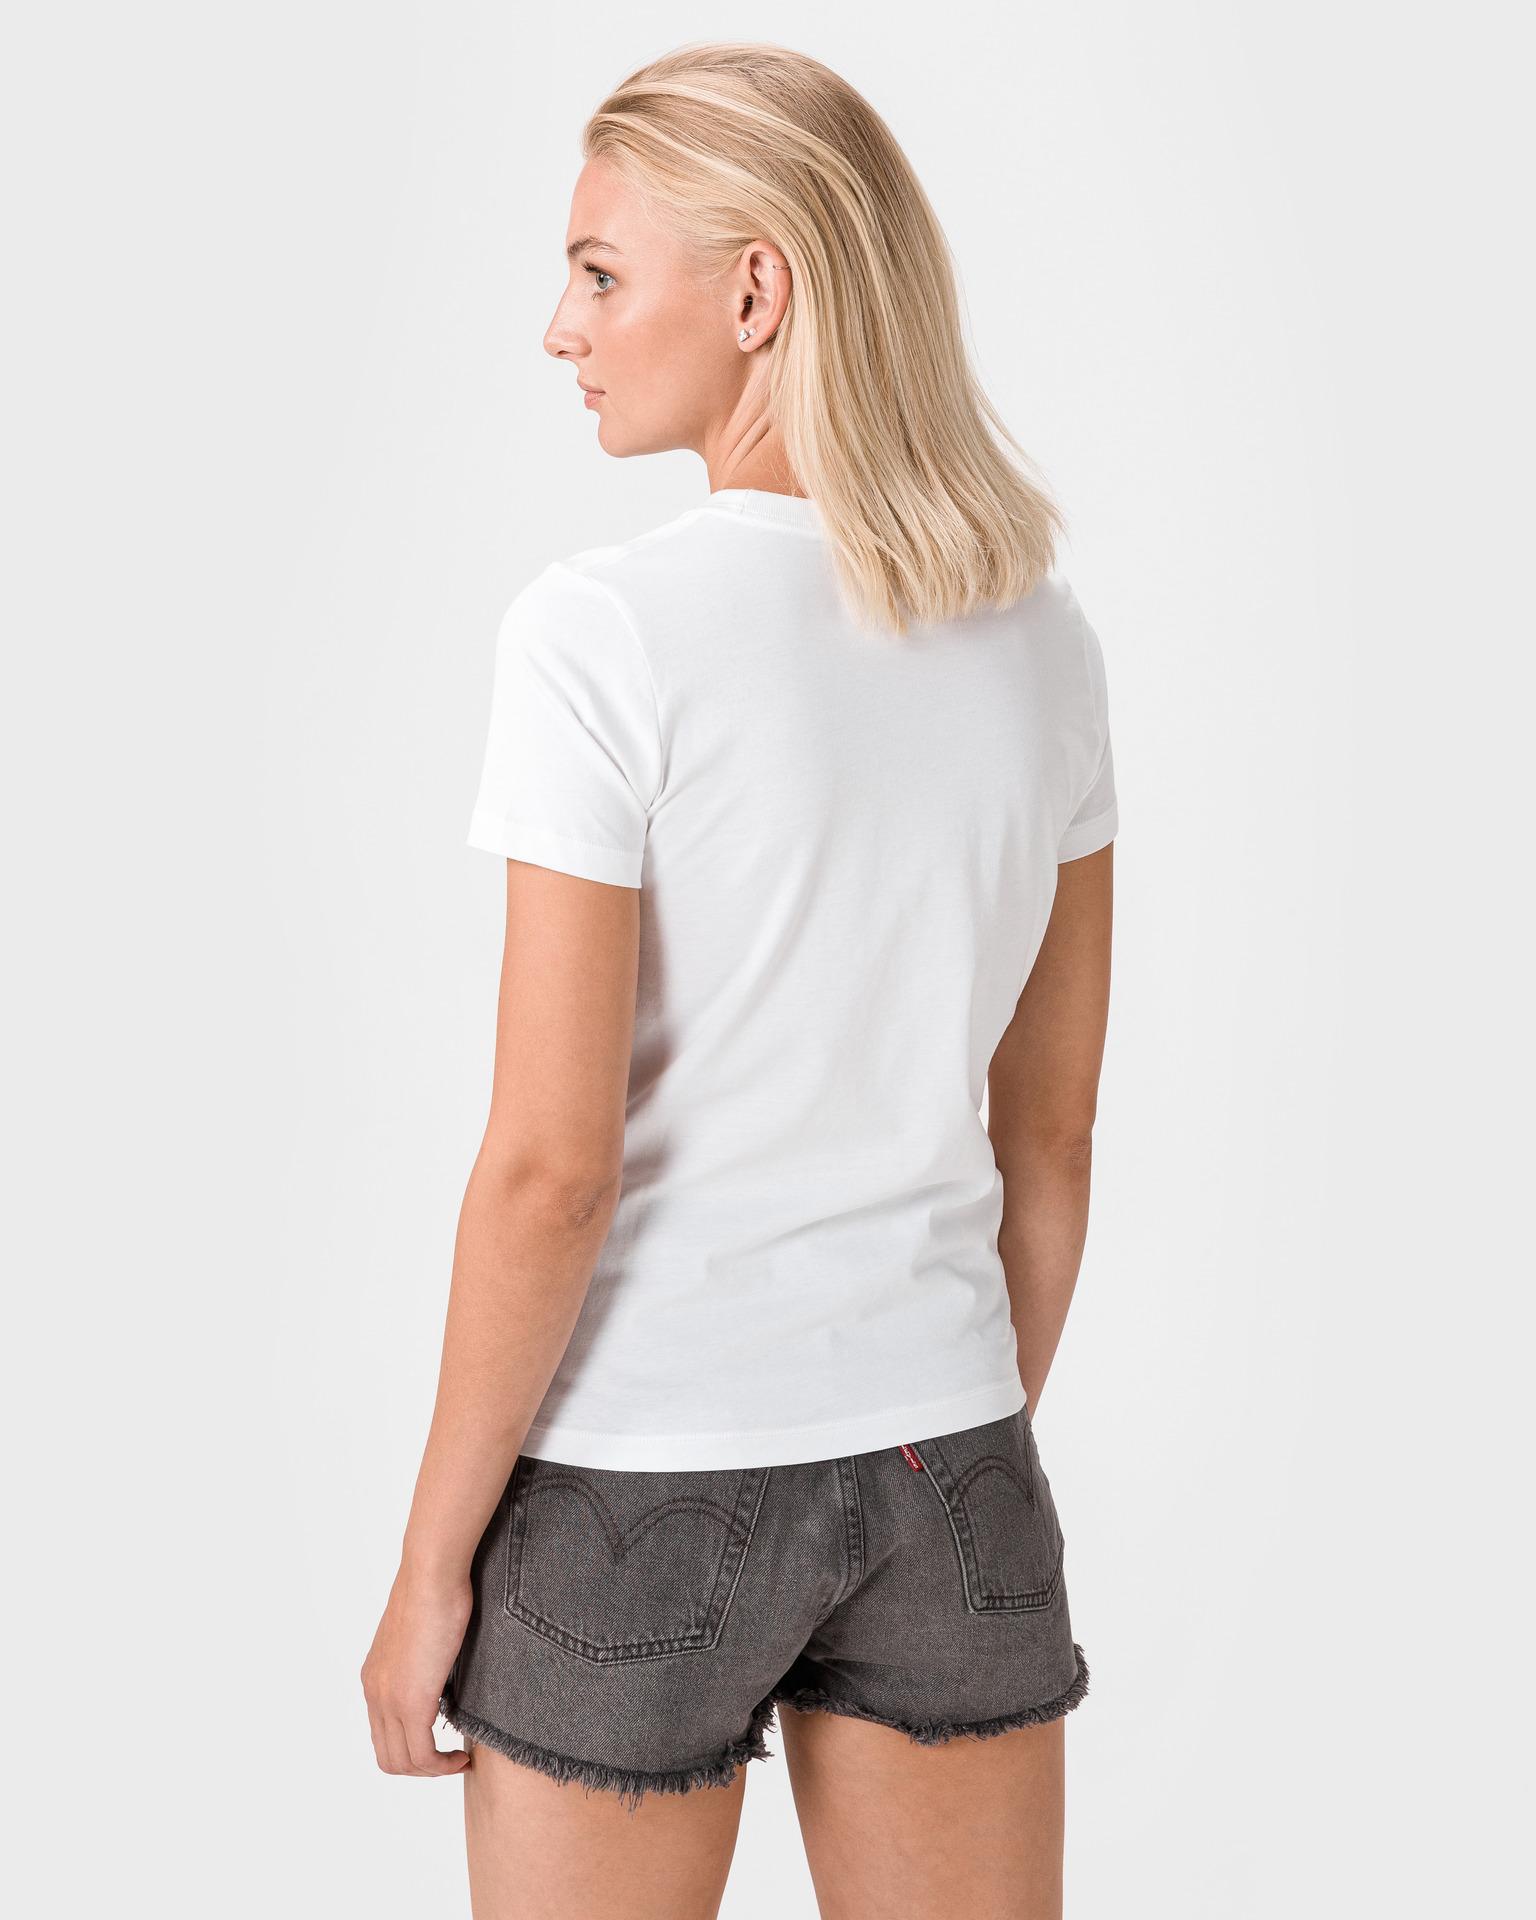 Converse biały damska koszulka